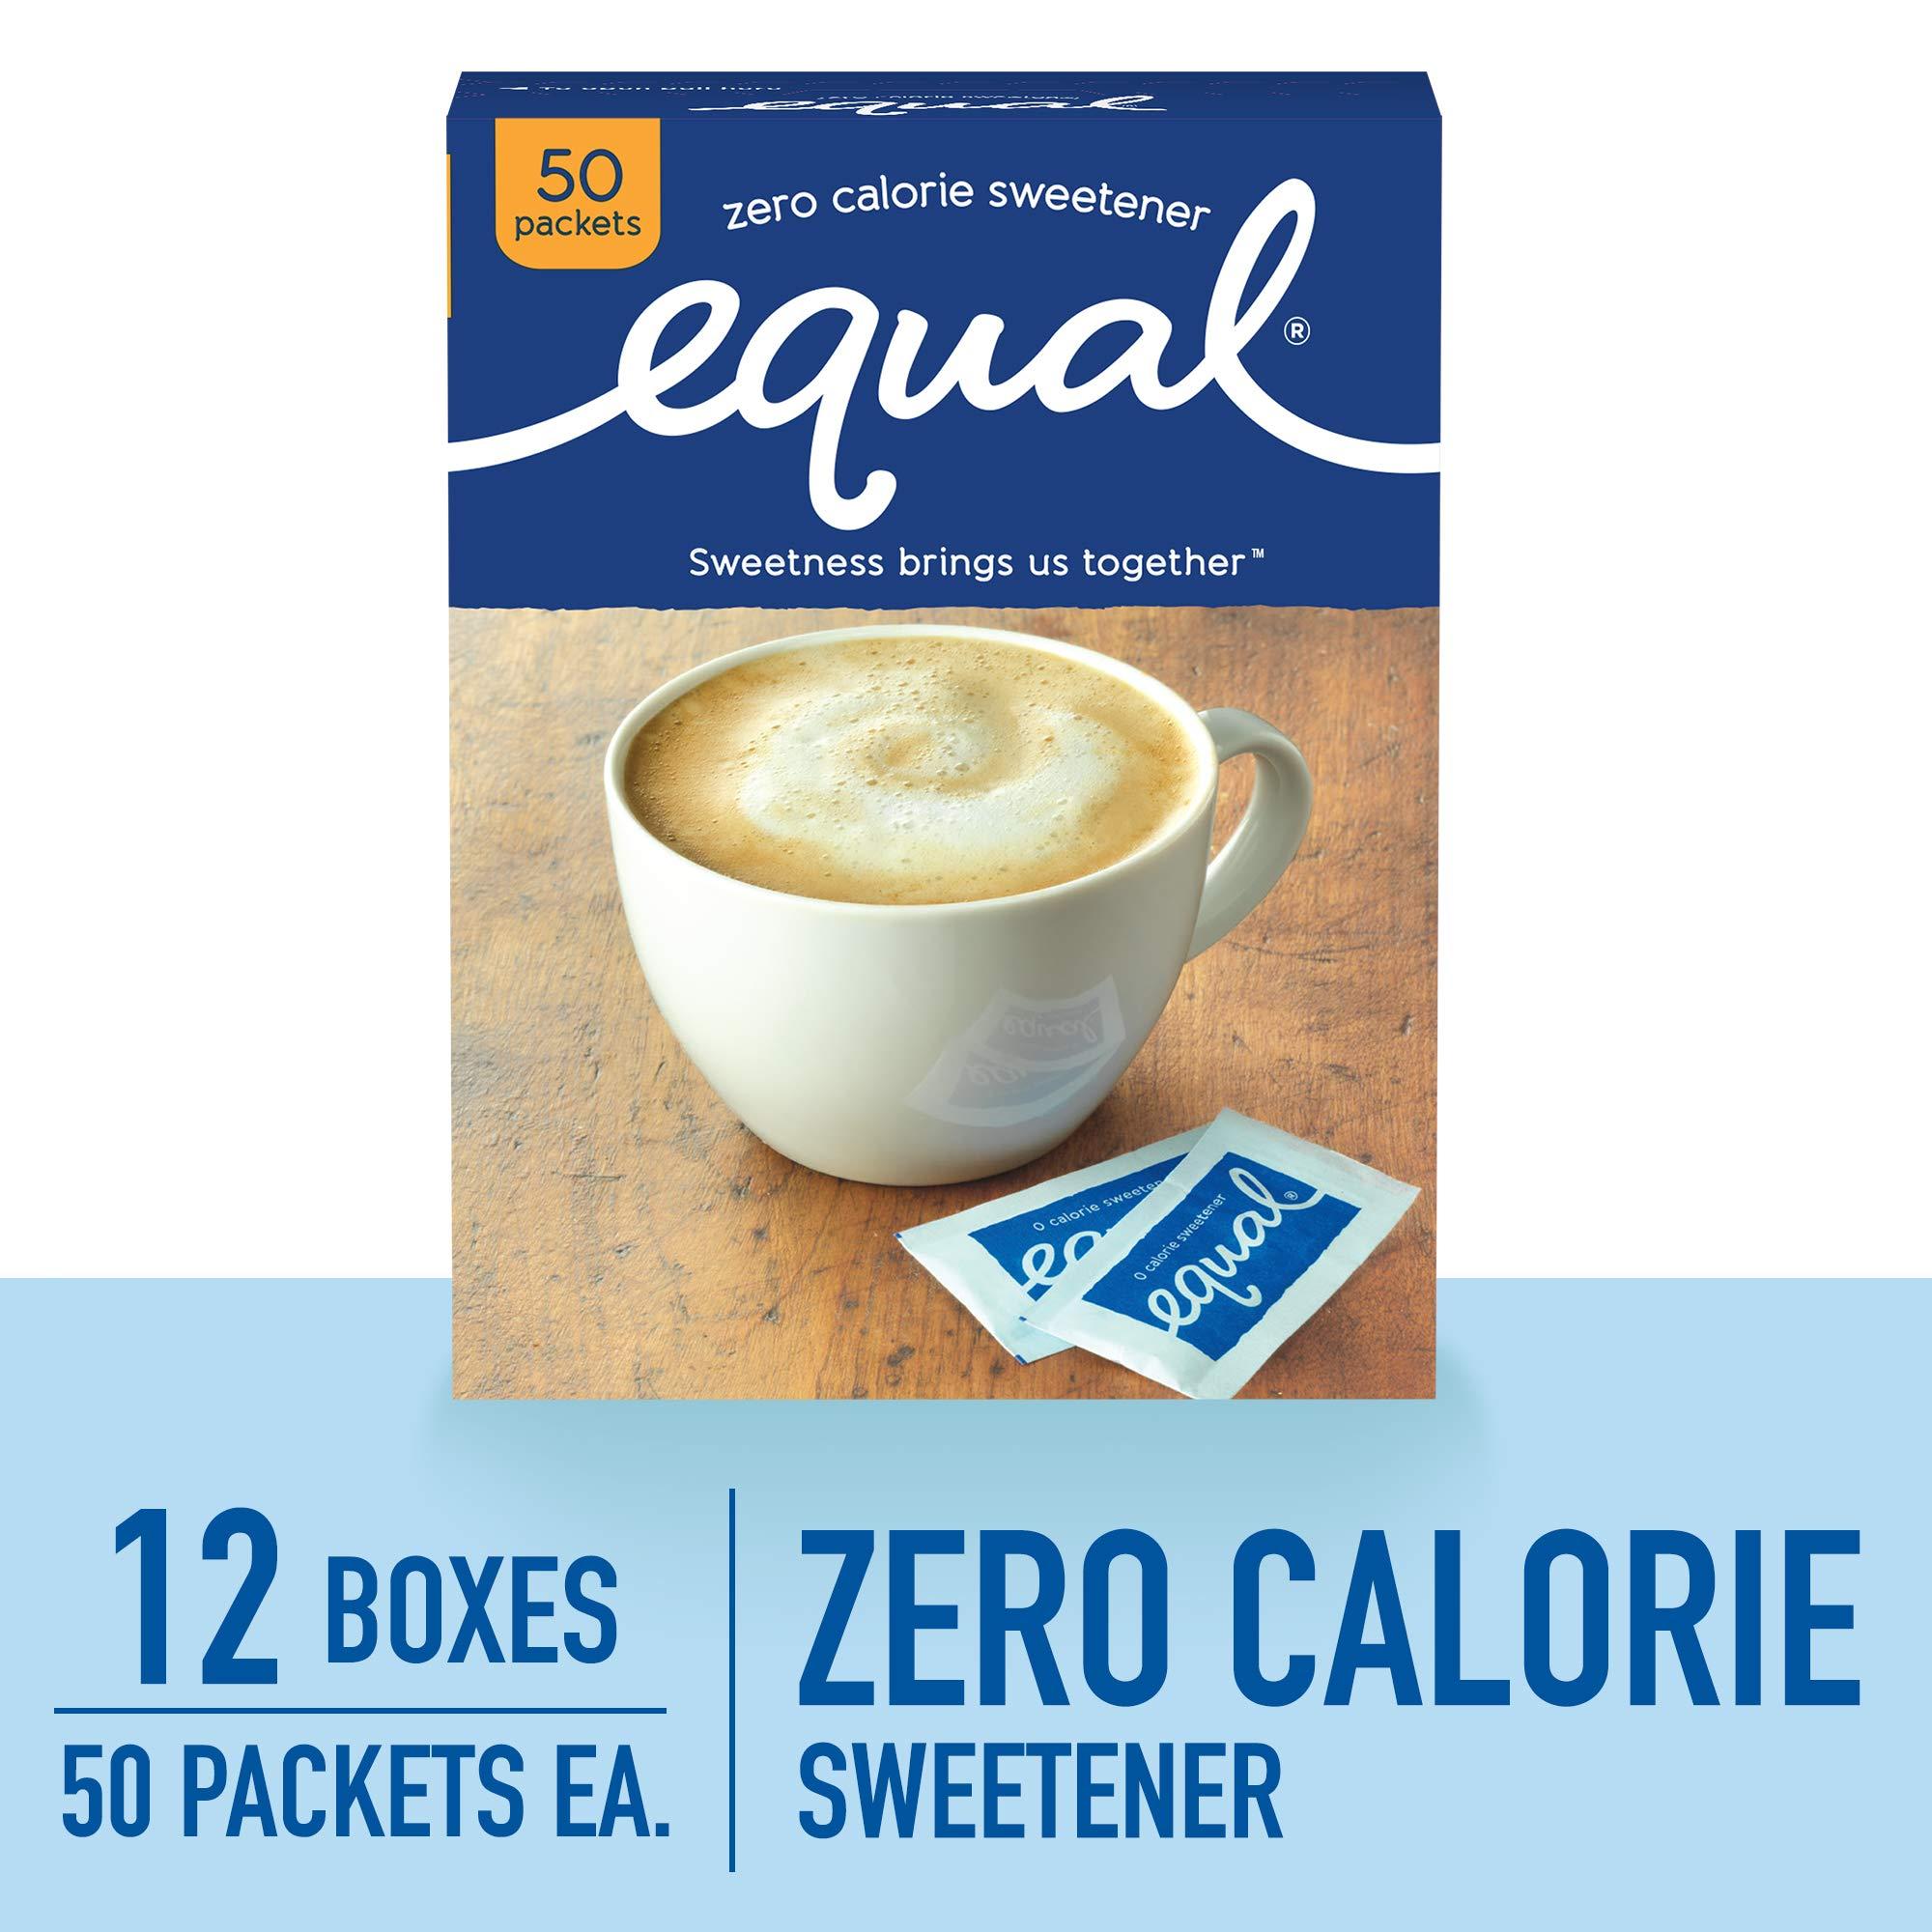 EQUAL 0 Calorie Sweetener, Sugar Substitute, Zero Calorie Sugar Alternative Sweetener Packets, Sugar Alternative, 50 Count (Pack of 12)